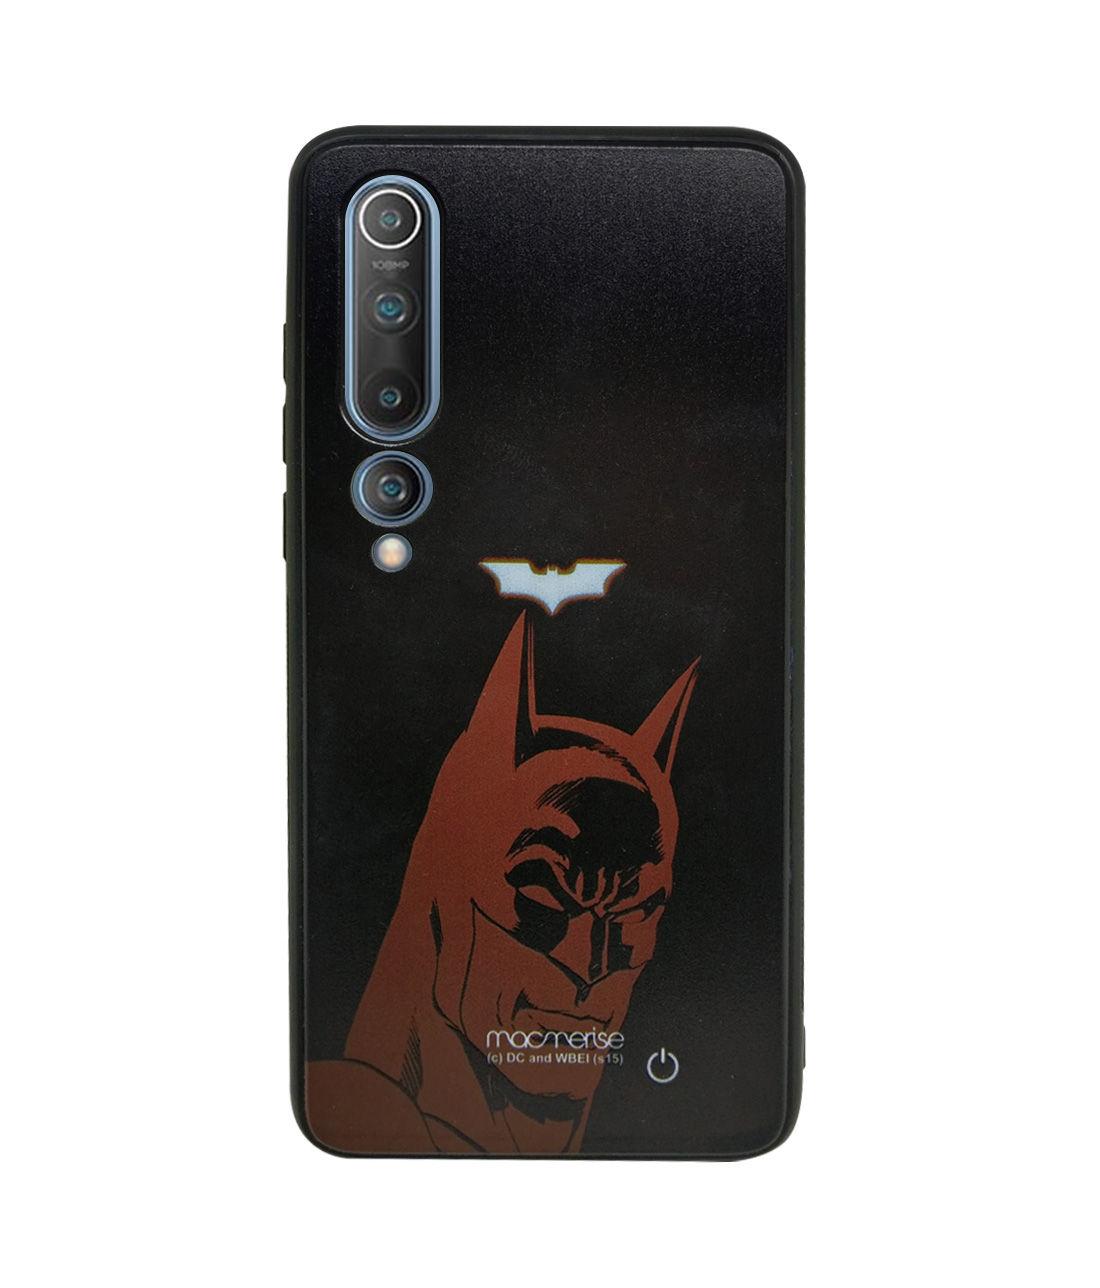 Silhouette Batman - Lumous LED Phone Case for Xiaomi Mi 10